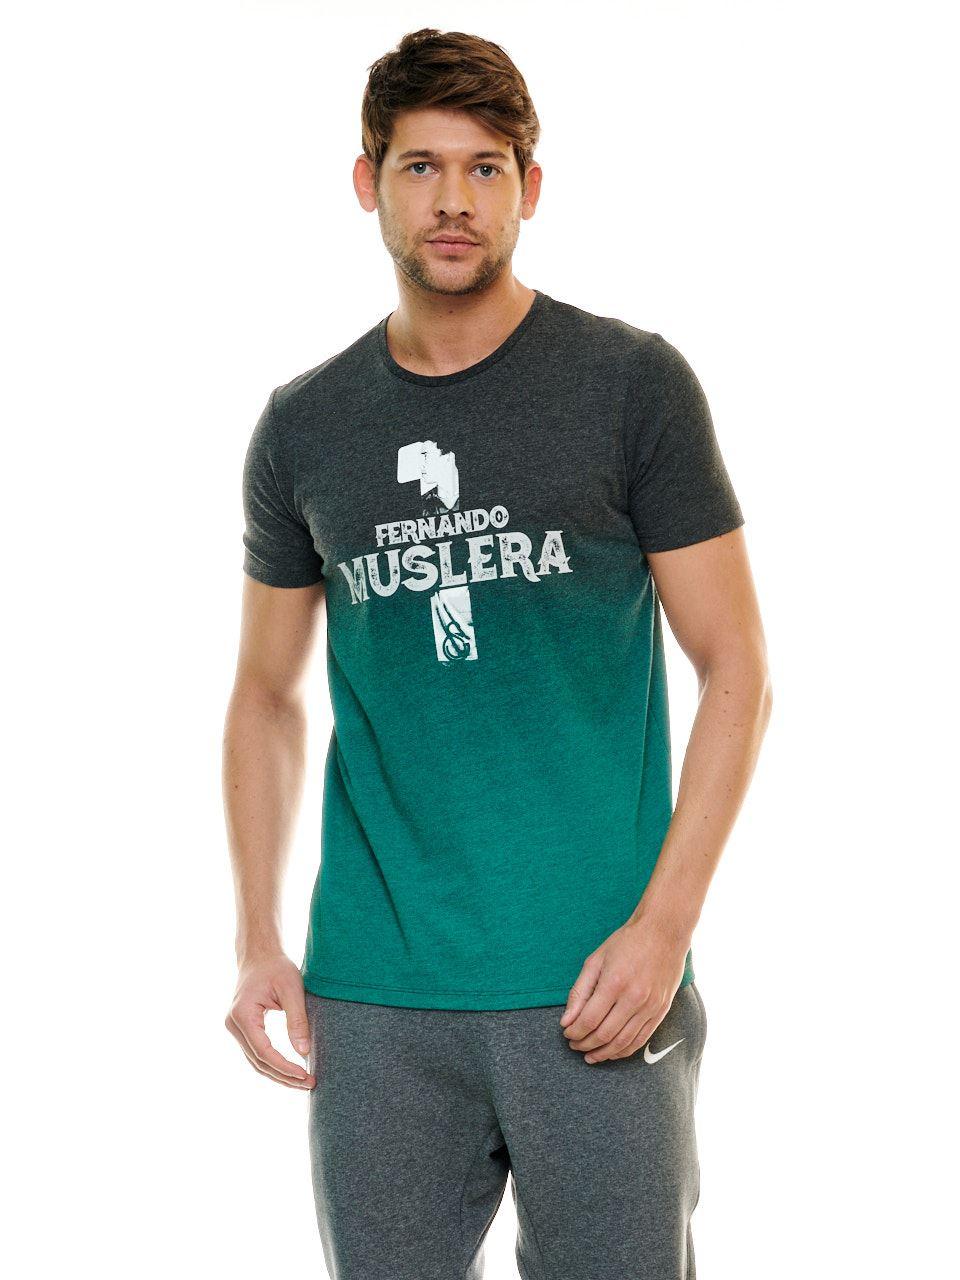 Galatasaray Muslera Erkek T-Shirt E202260